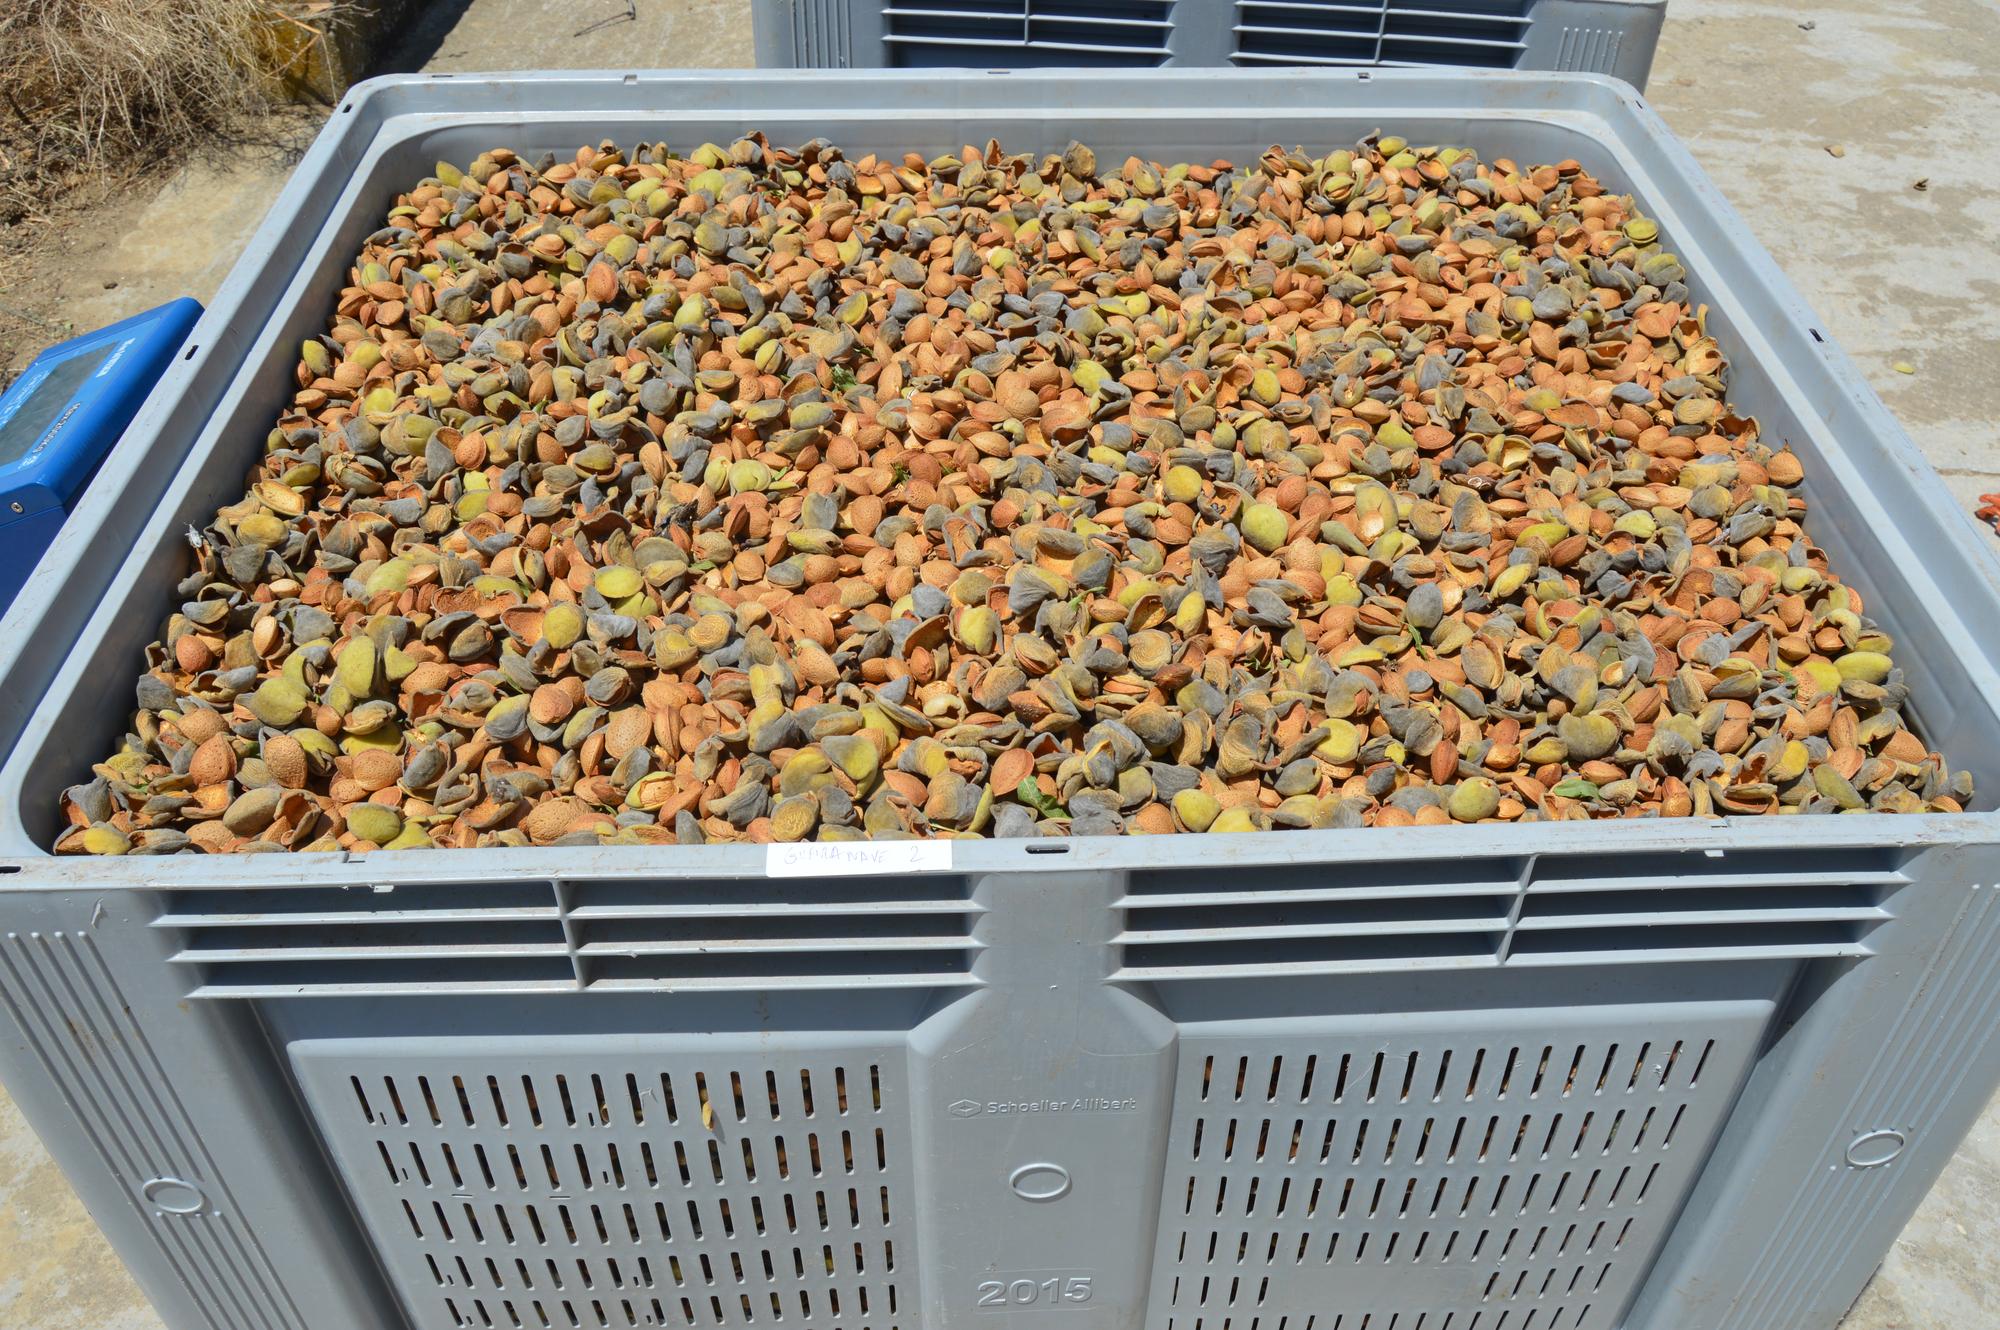 Organic biodynamic Demeter certified almonds Cortijo el Puerto Ingeoliva